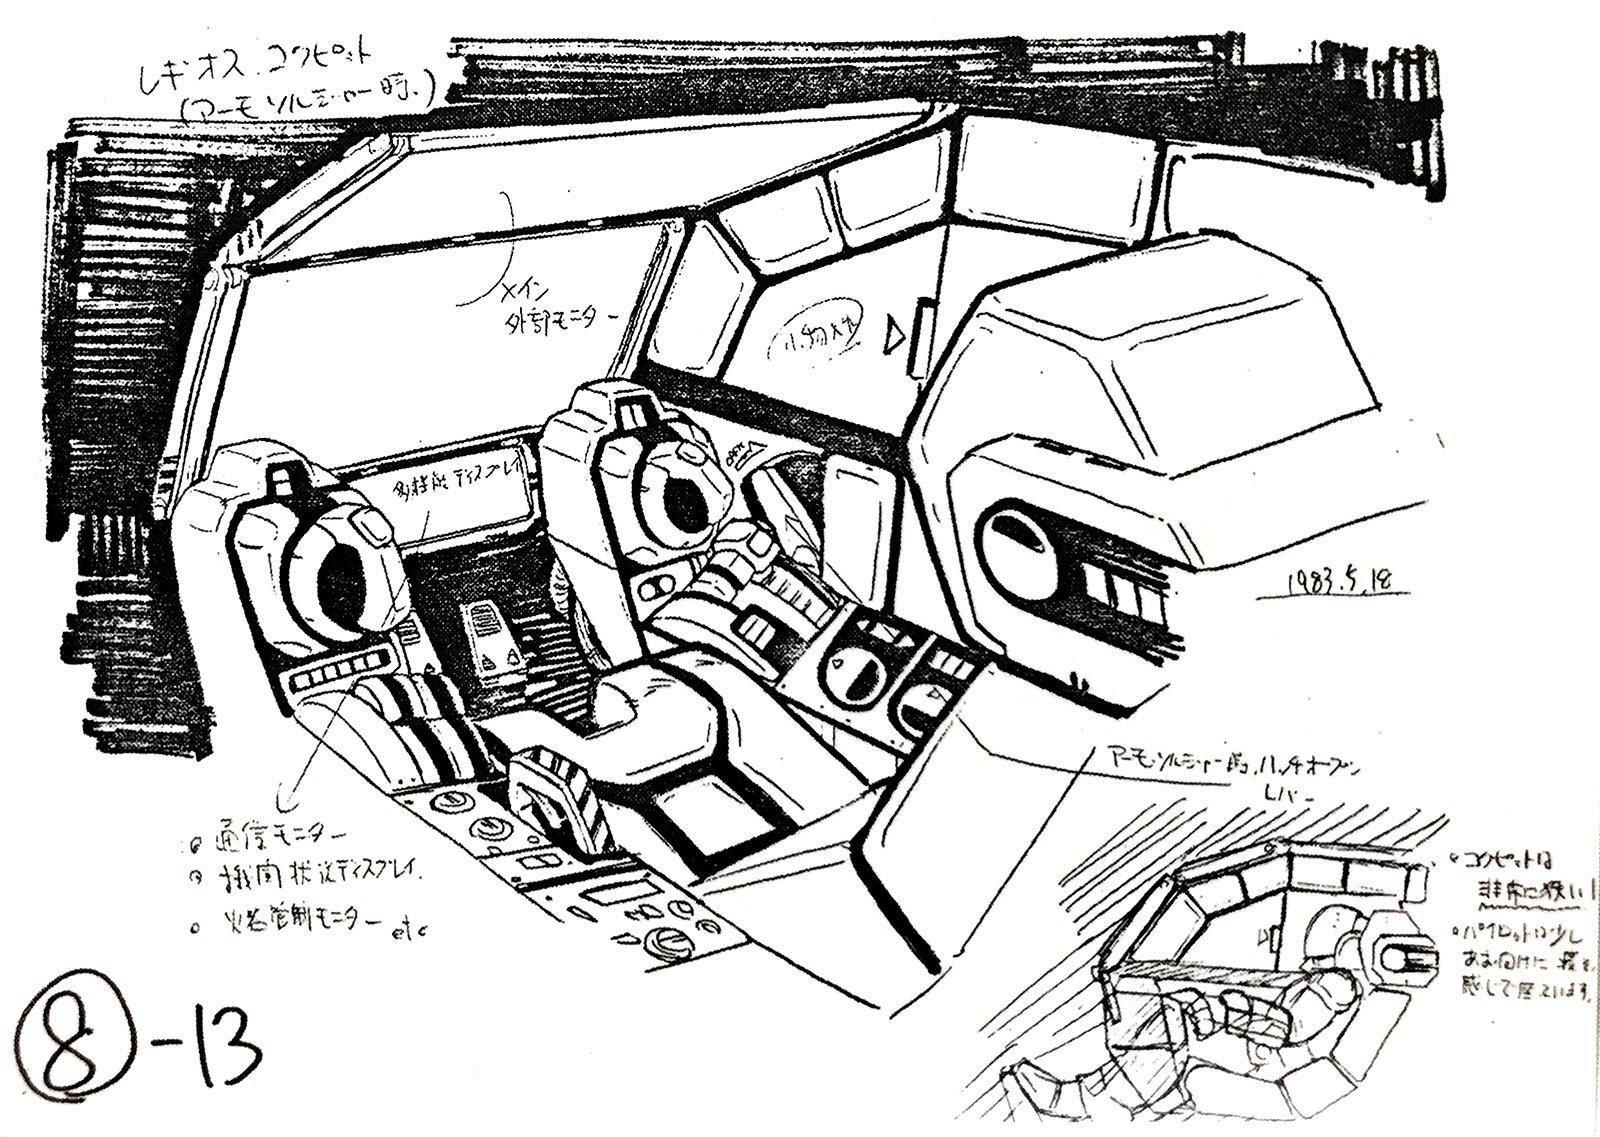 1527597303_Legiosscockpitscreens.jpg.42bedcbe22c3b15748c2298607a34a57.jpg